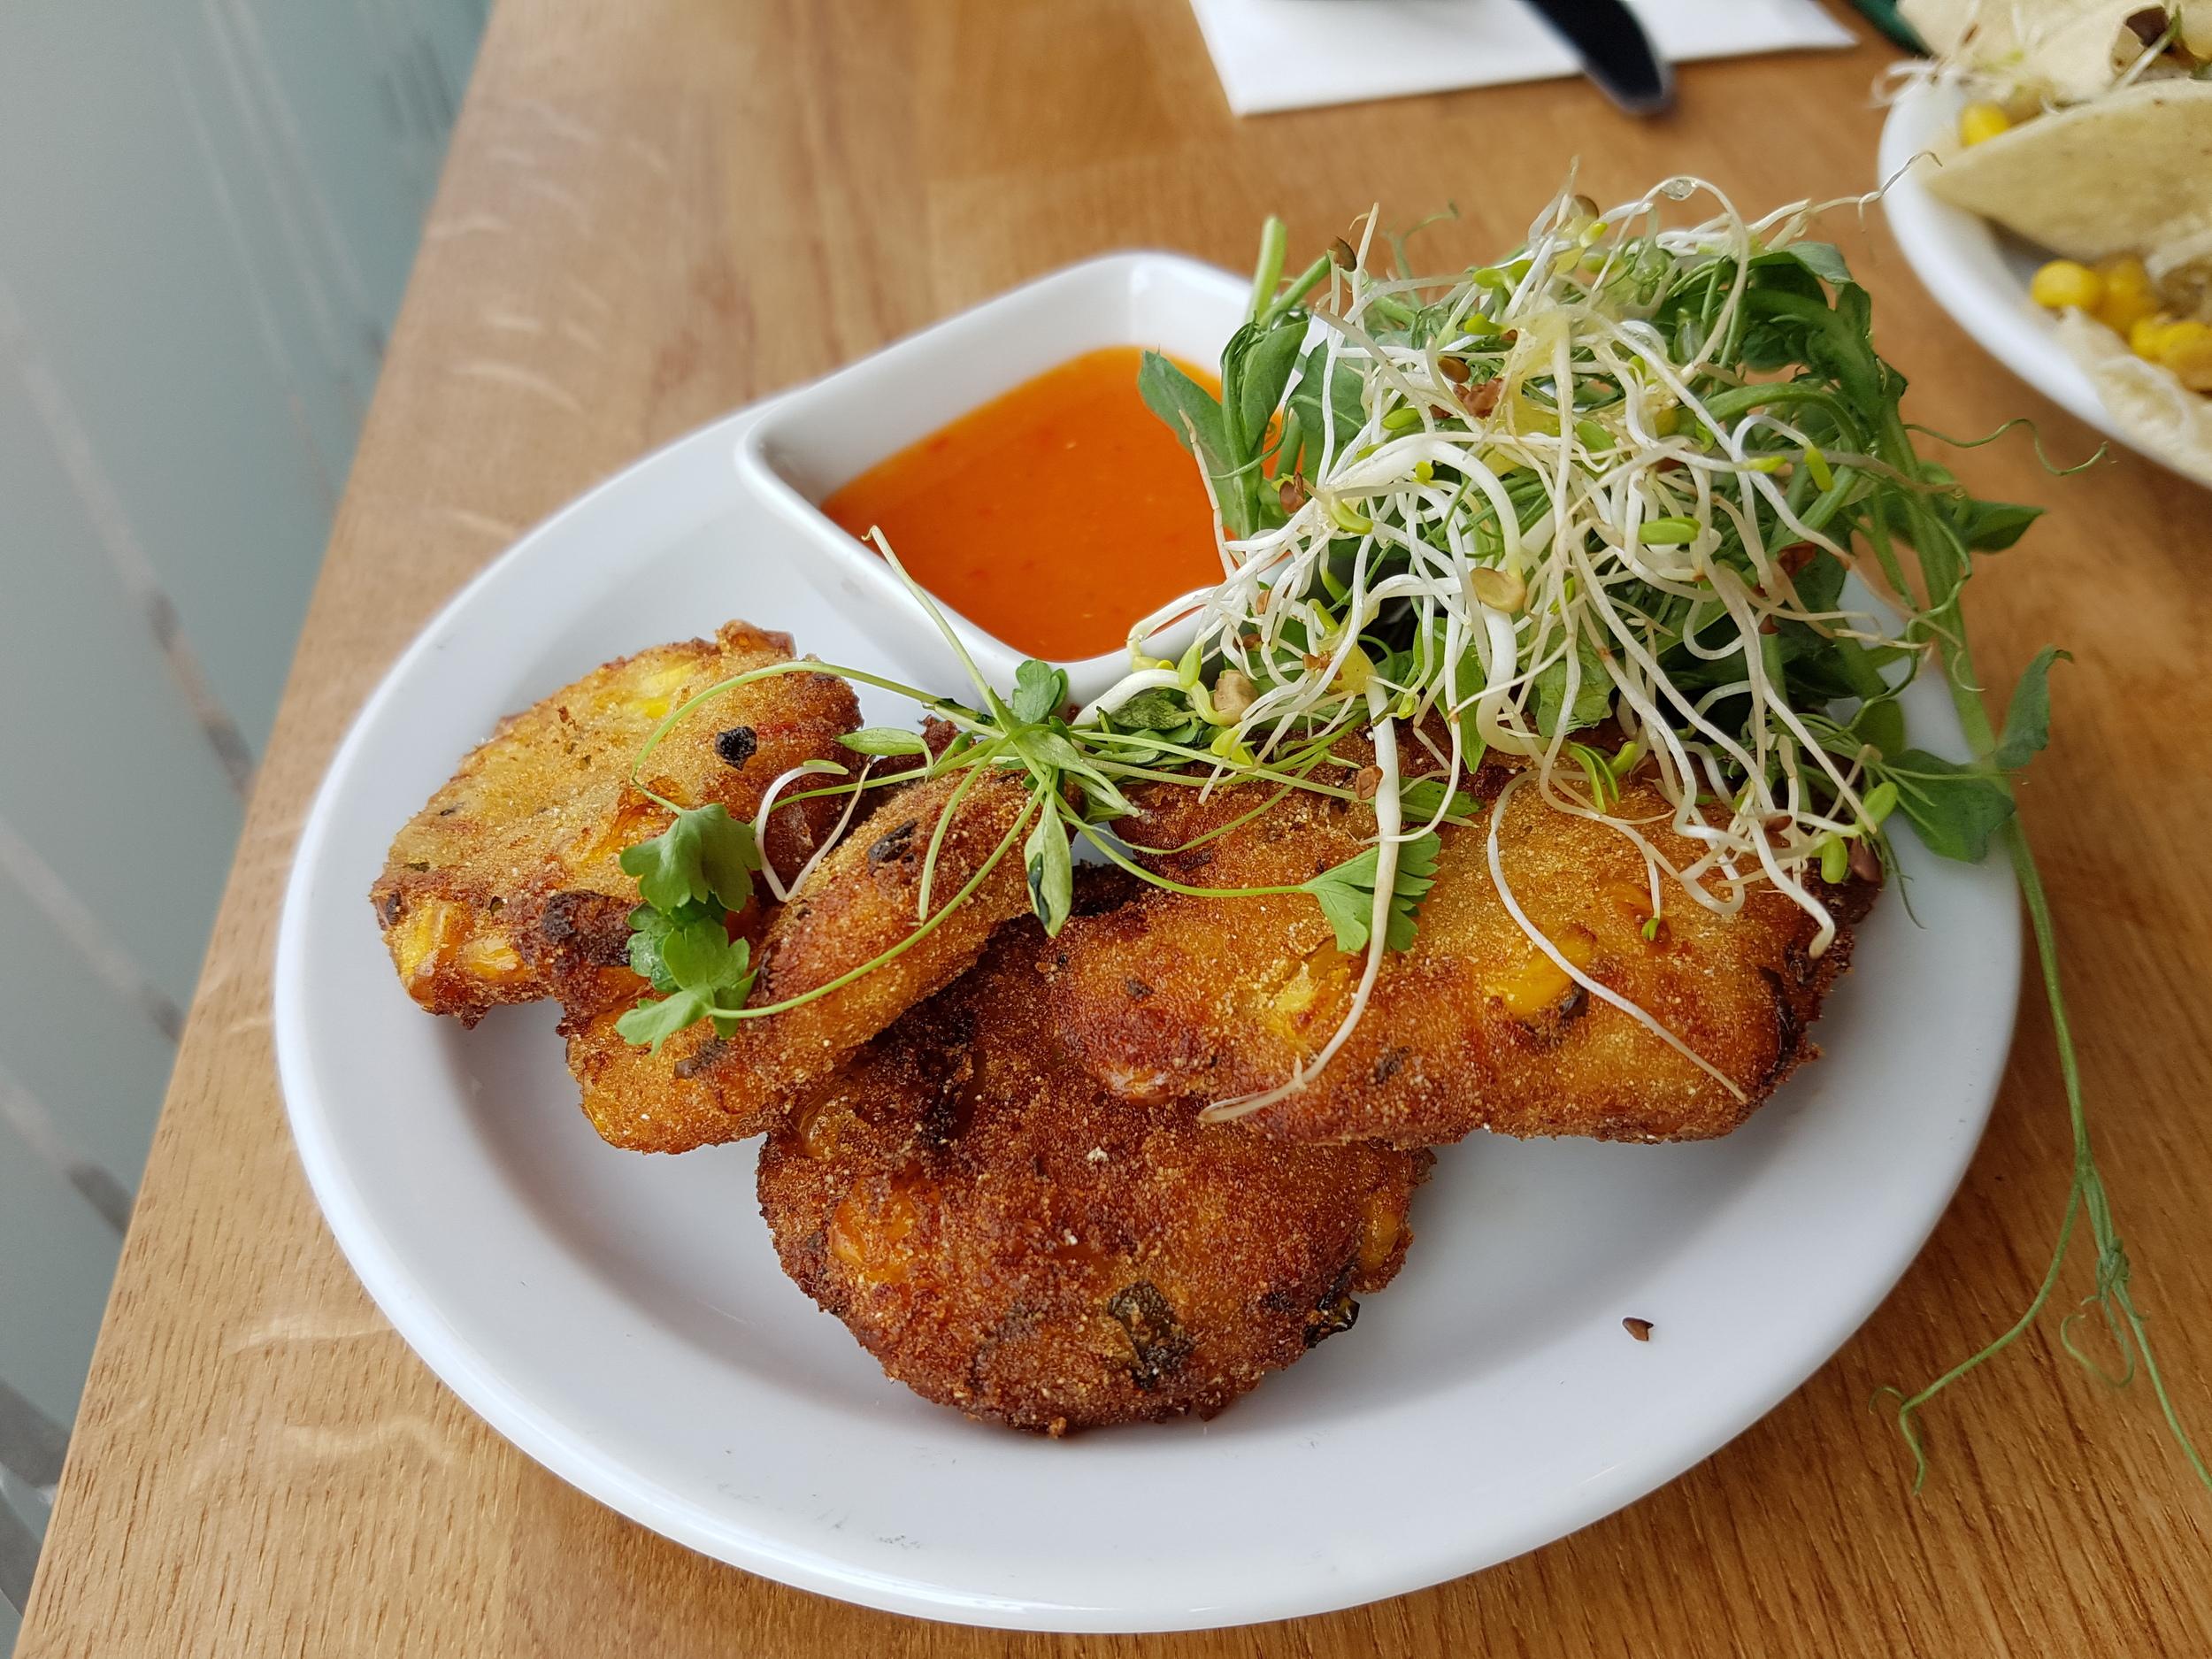 Thai cakes: potatoes, palm hearts, coriander, mooli, chilli, lemongrass, Thai paste served with sweet lime sauce